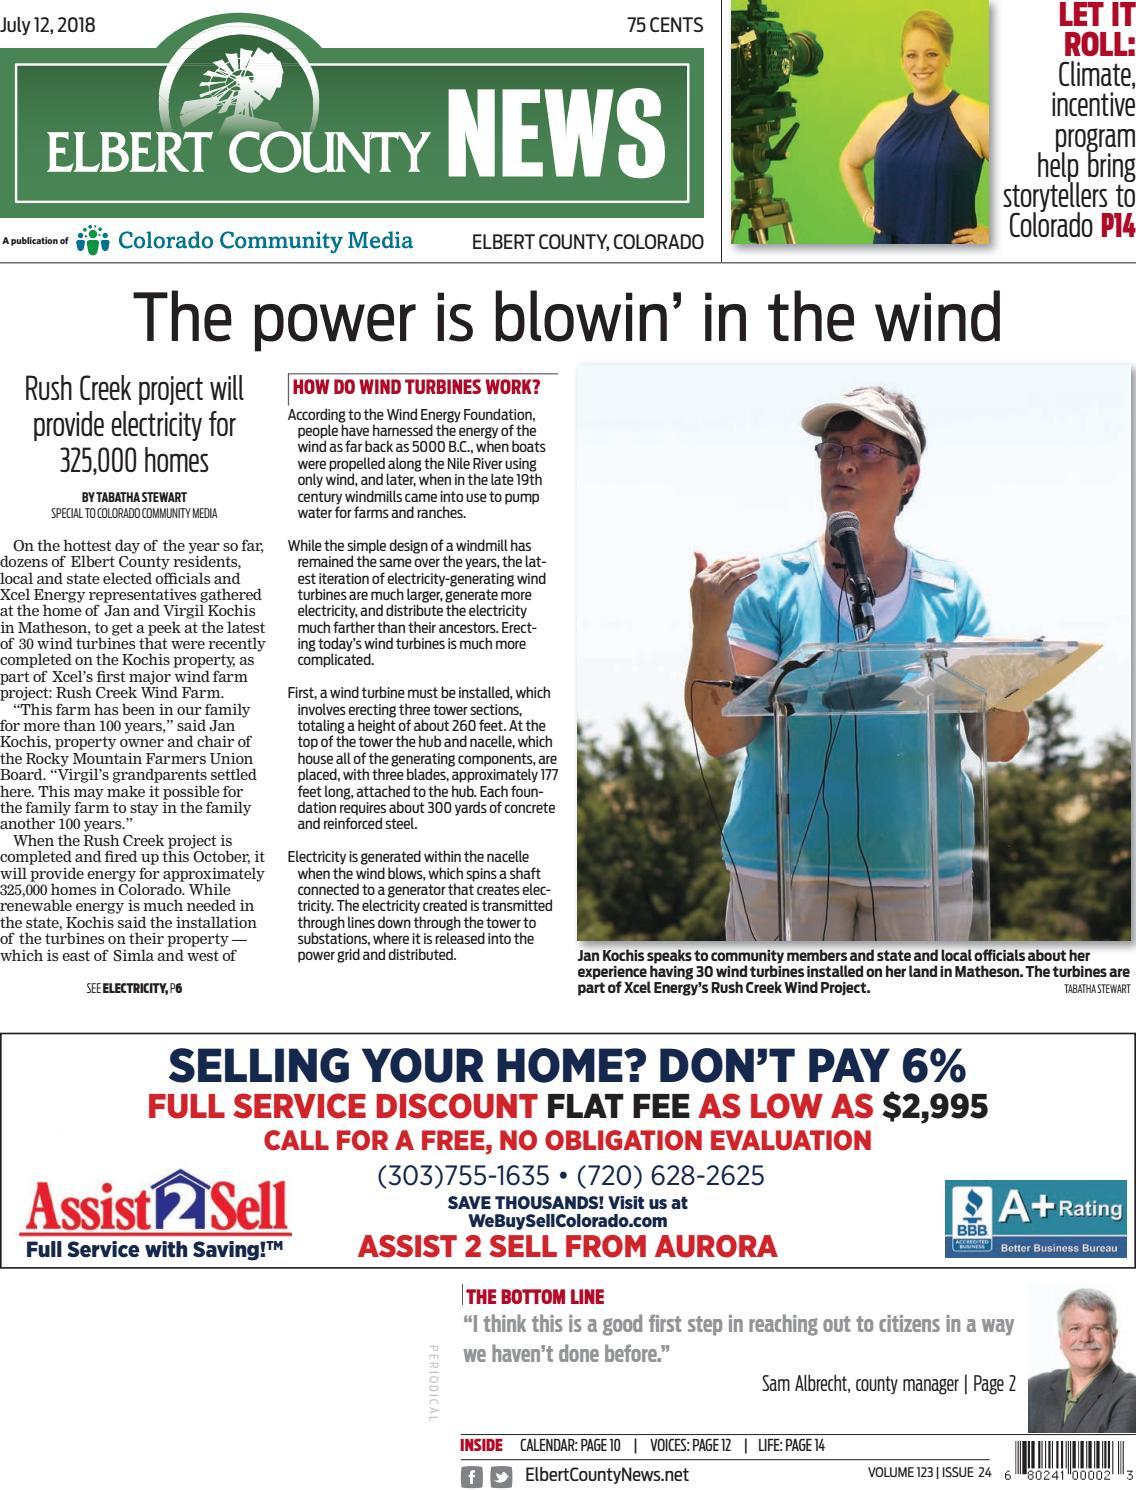 Elbert County News 0712 by Colorado Community Media - issuu